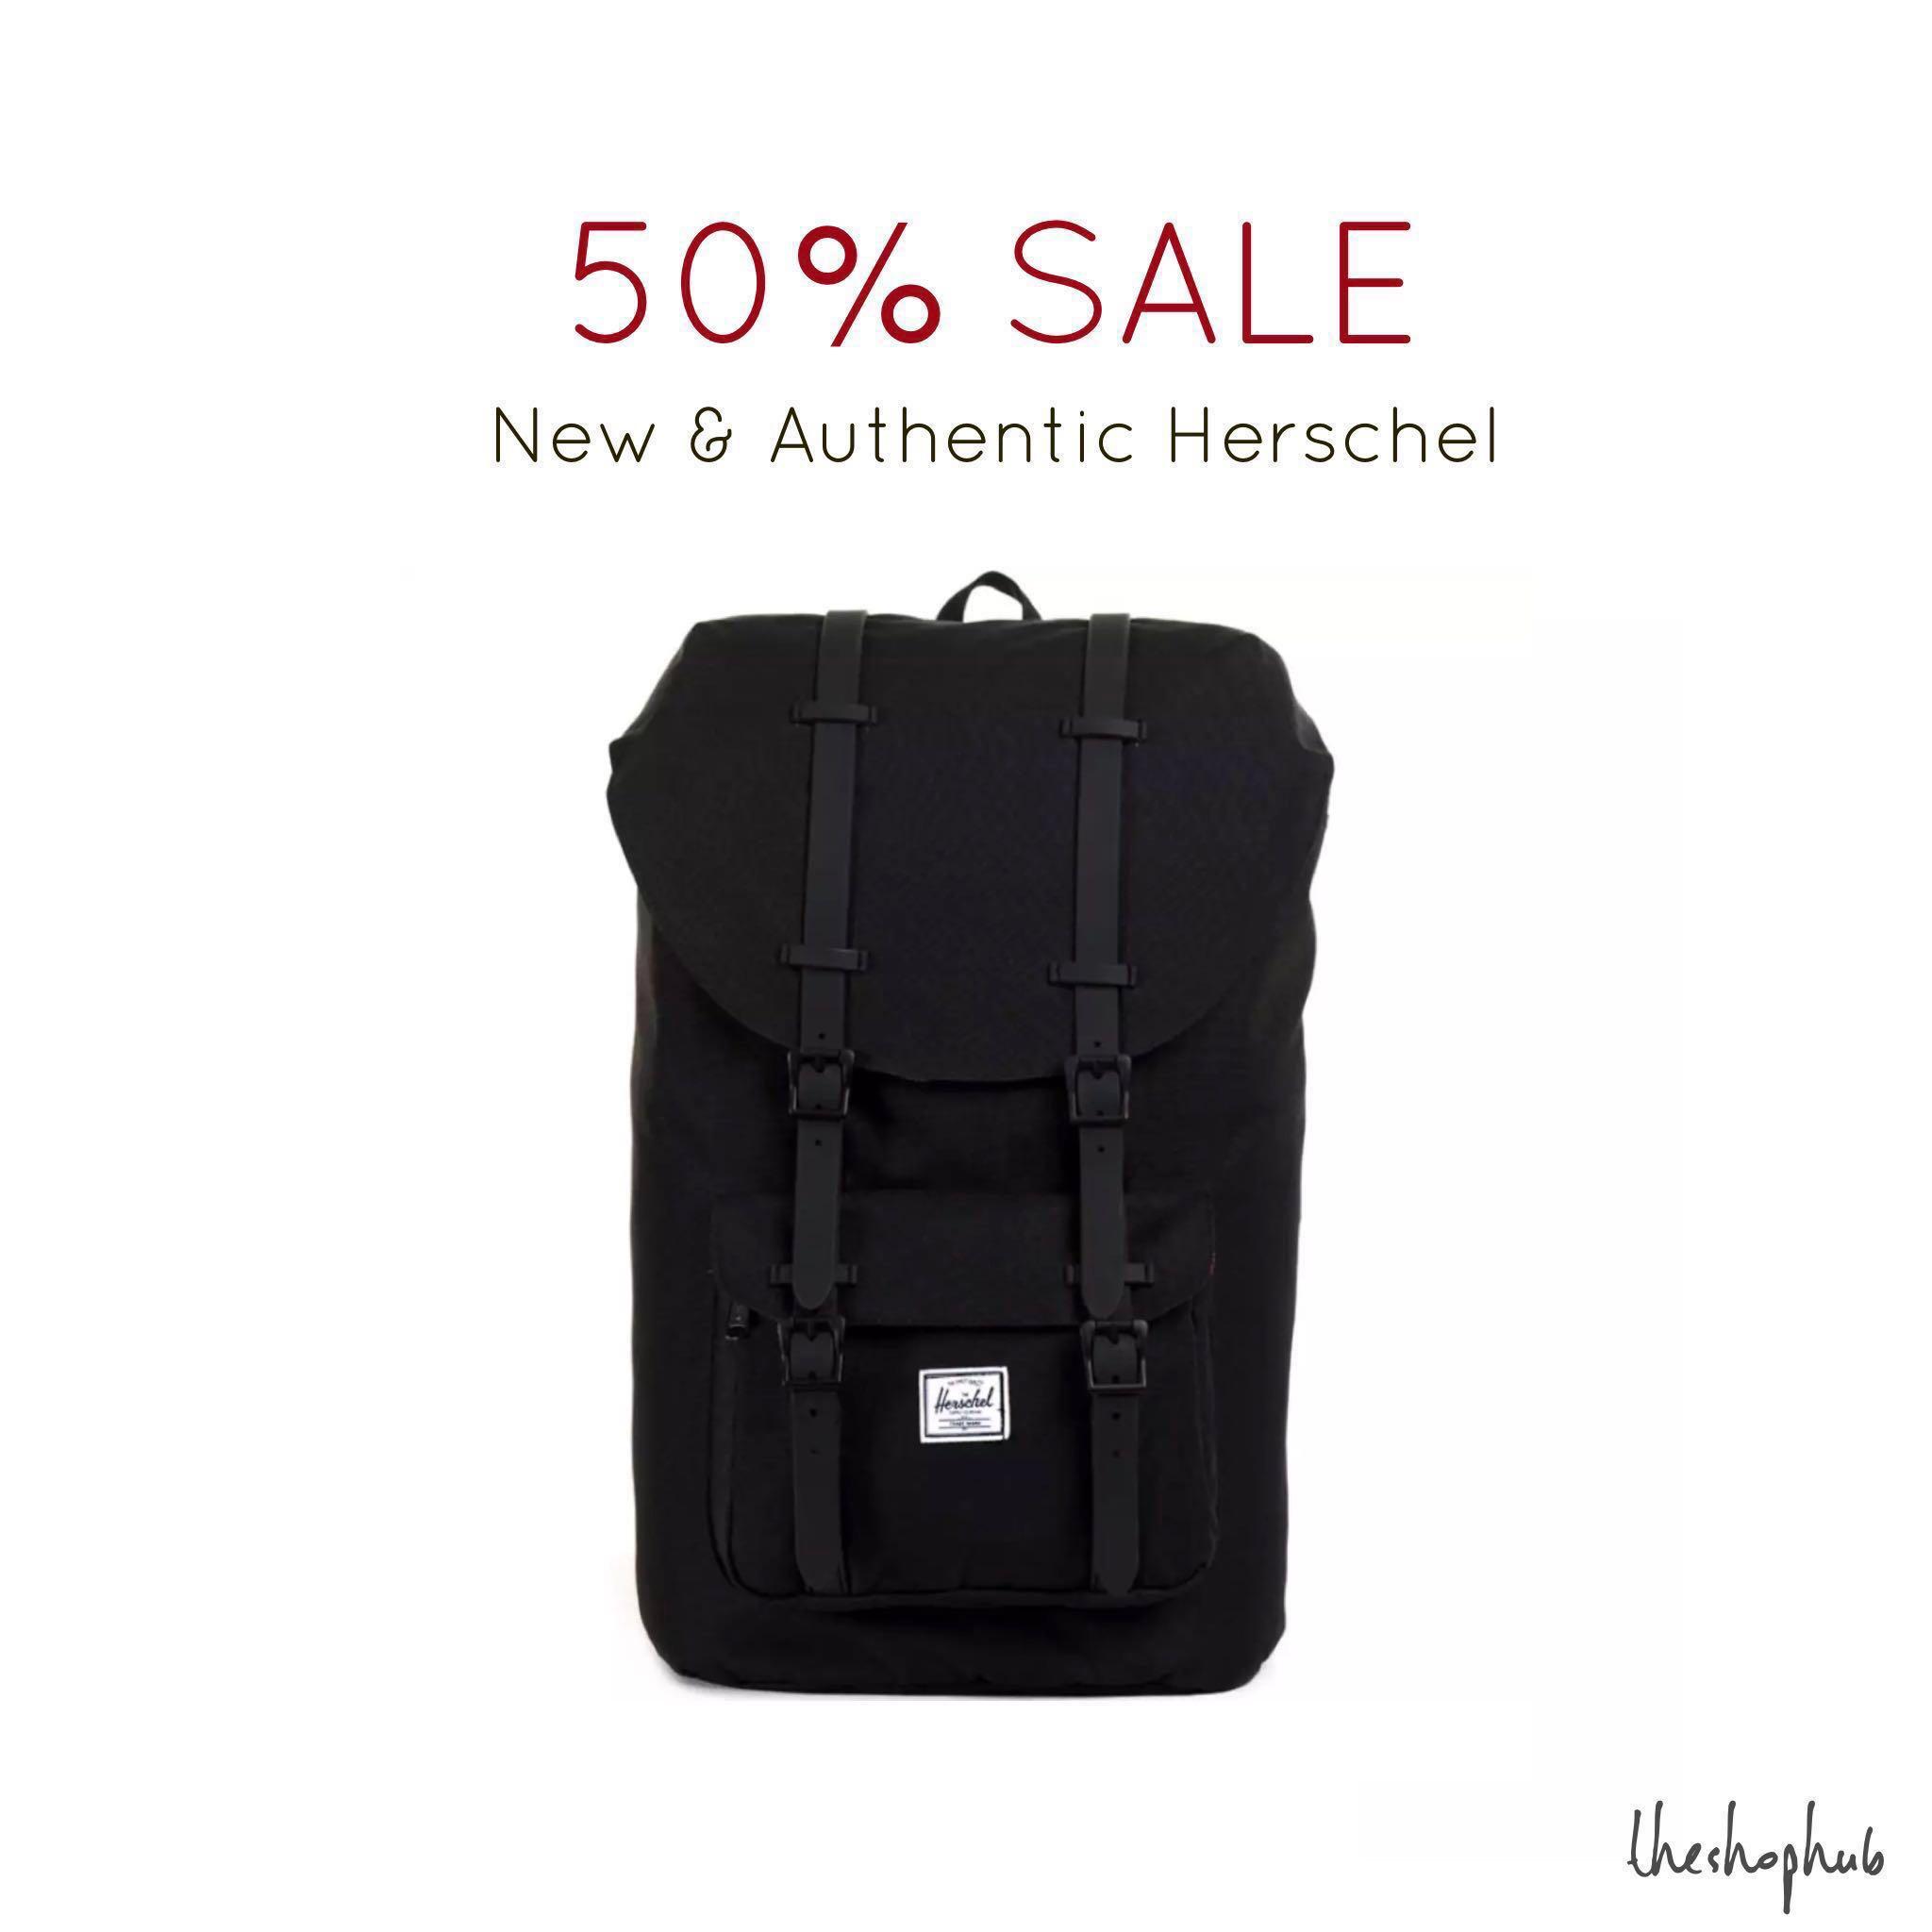 dbe0ebc7d0  CHEAPEST  Authentic Herschel Little America Backpack- Black